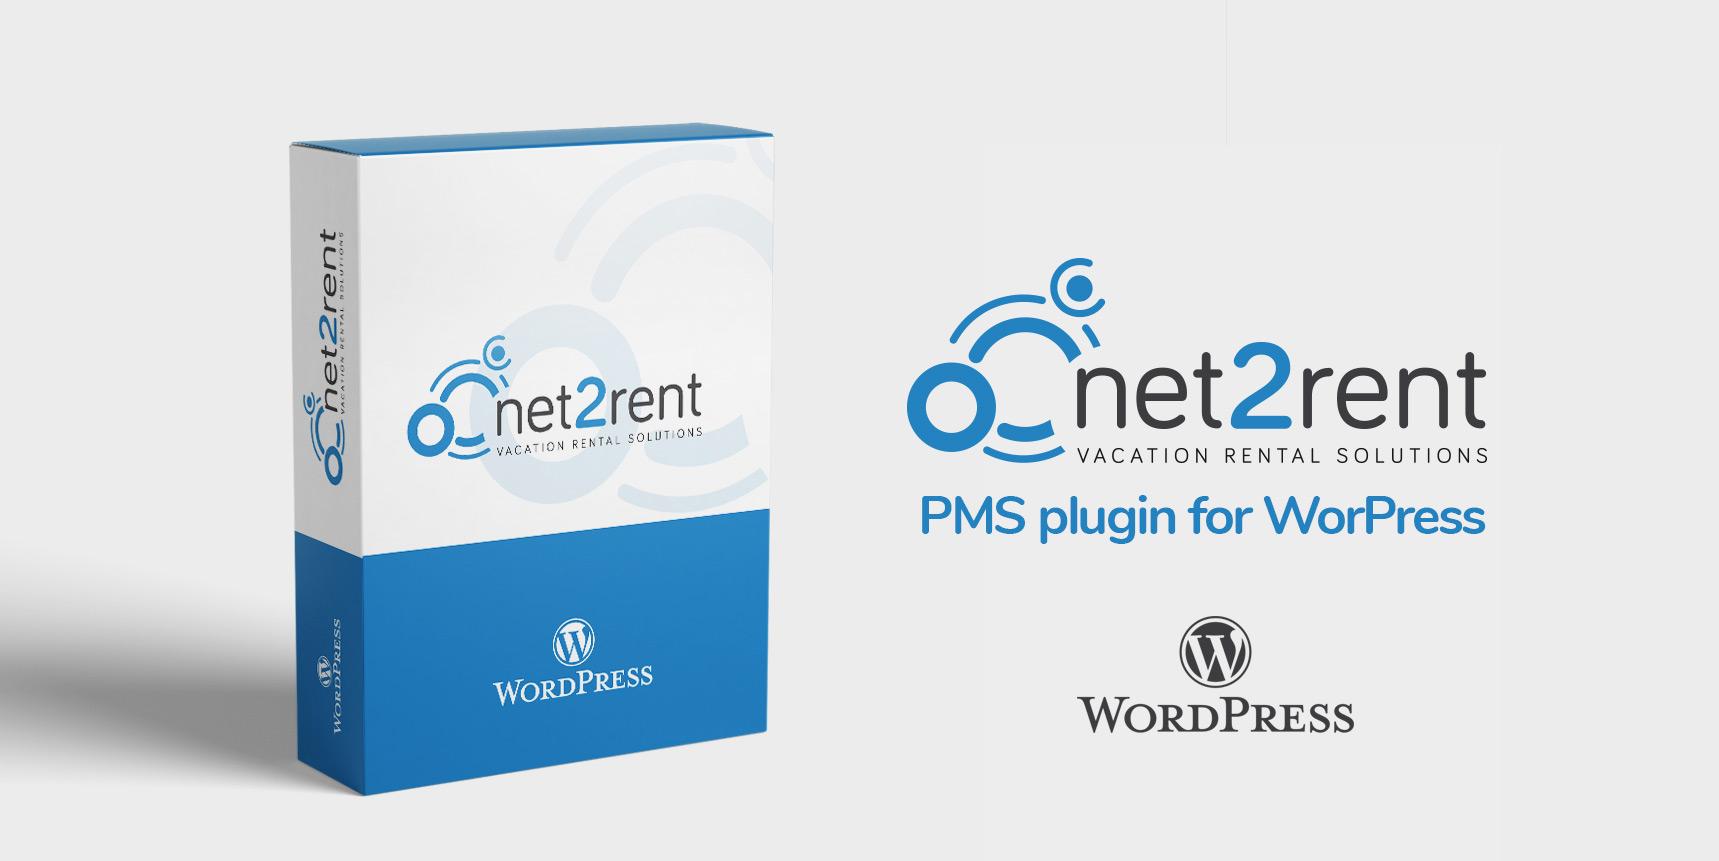 net2rent PMS plugin for WordPress